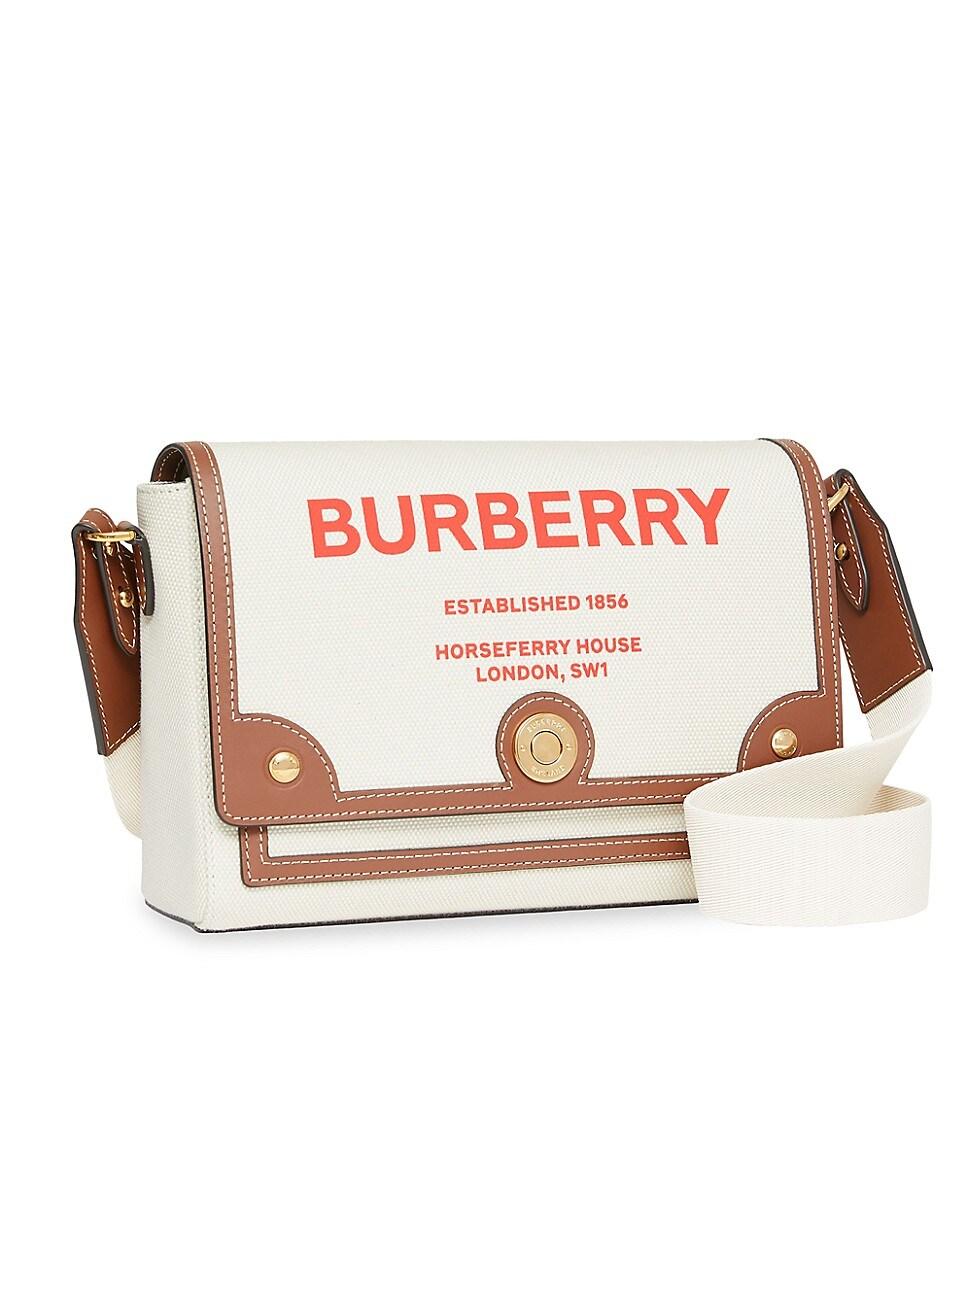 Burberry WOMEN'S MEDIUM NOTE CANVAS CROSSBODY BAG